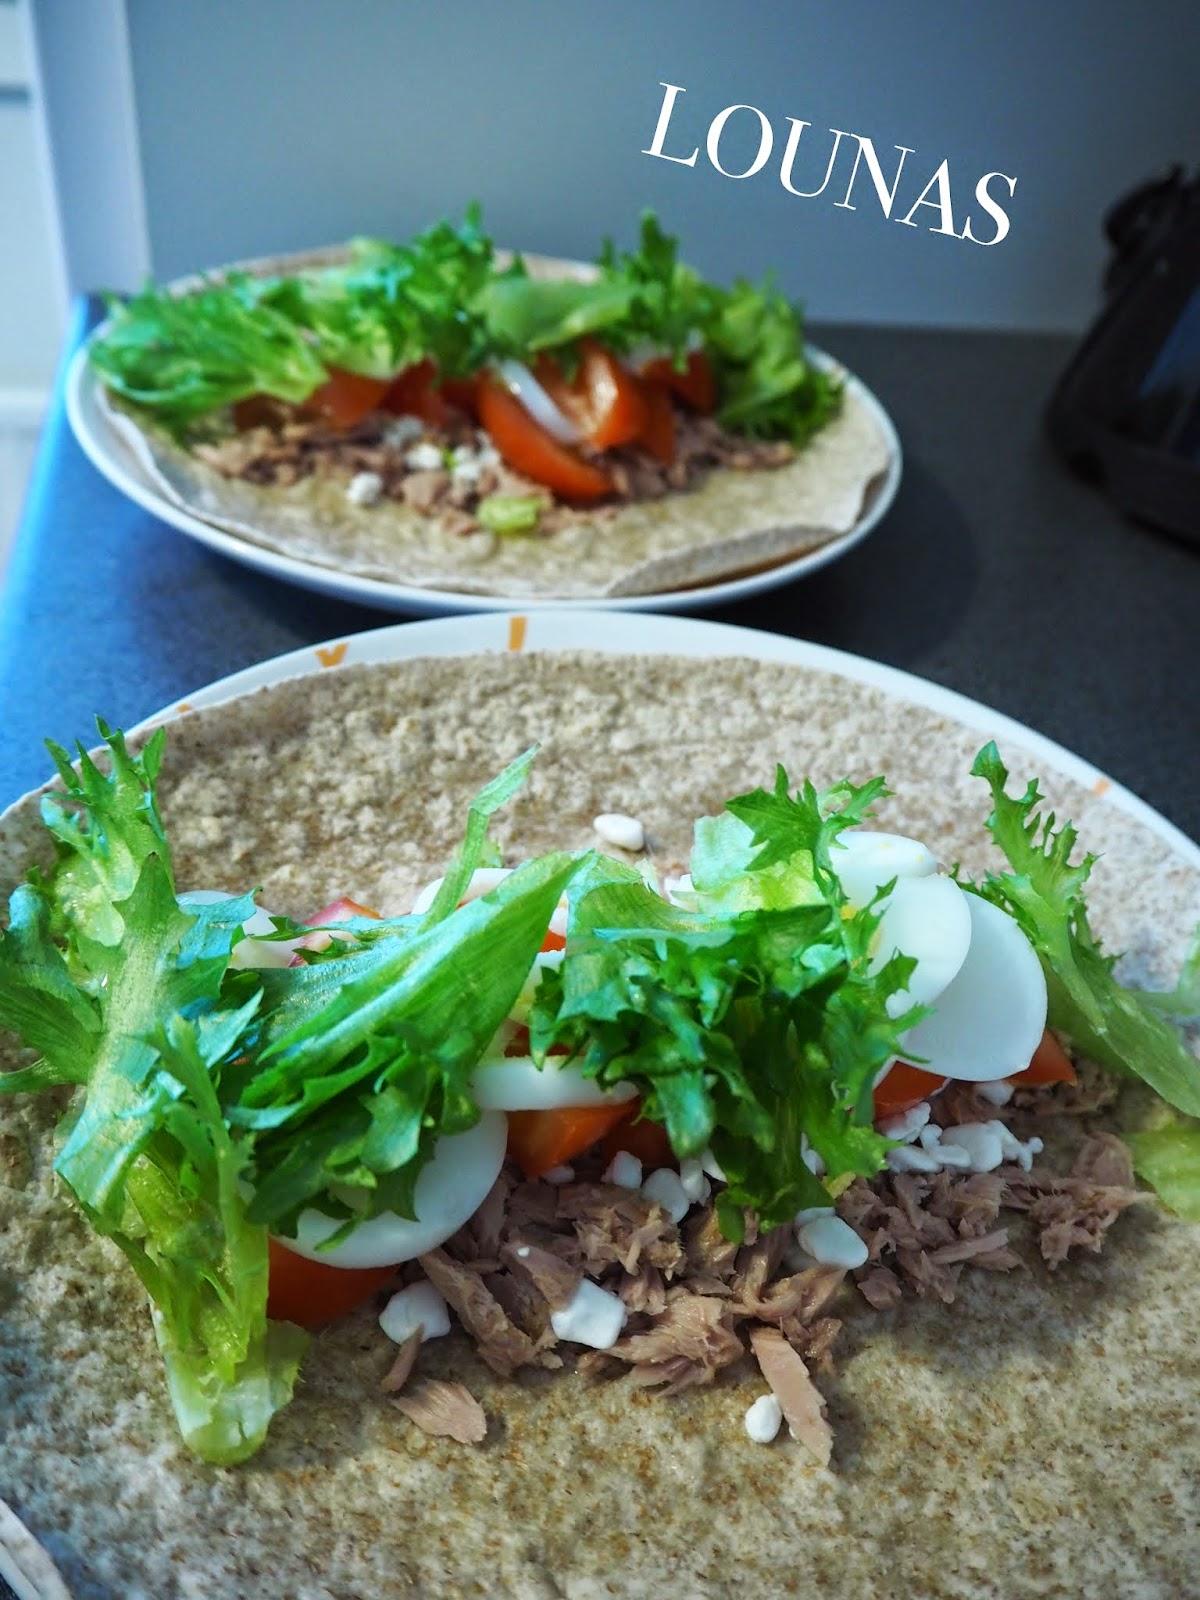 lounas, luch, wpar, kayla itsines, help, eating plan, healhty lifestyle, ruoka ohjelma,